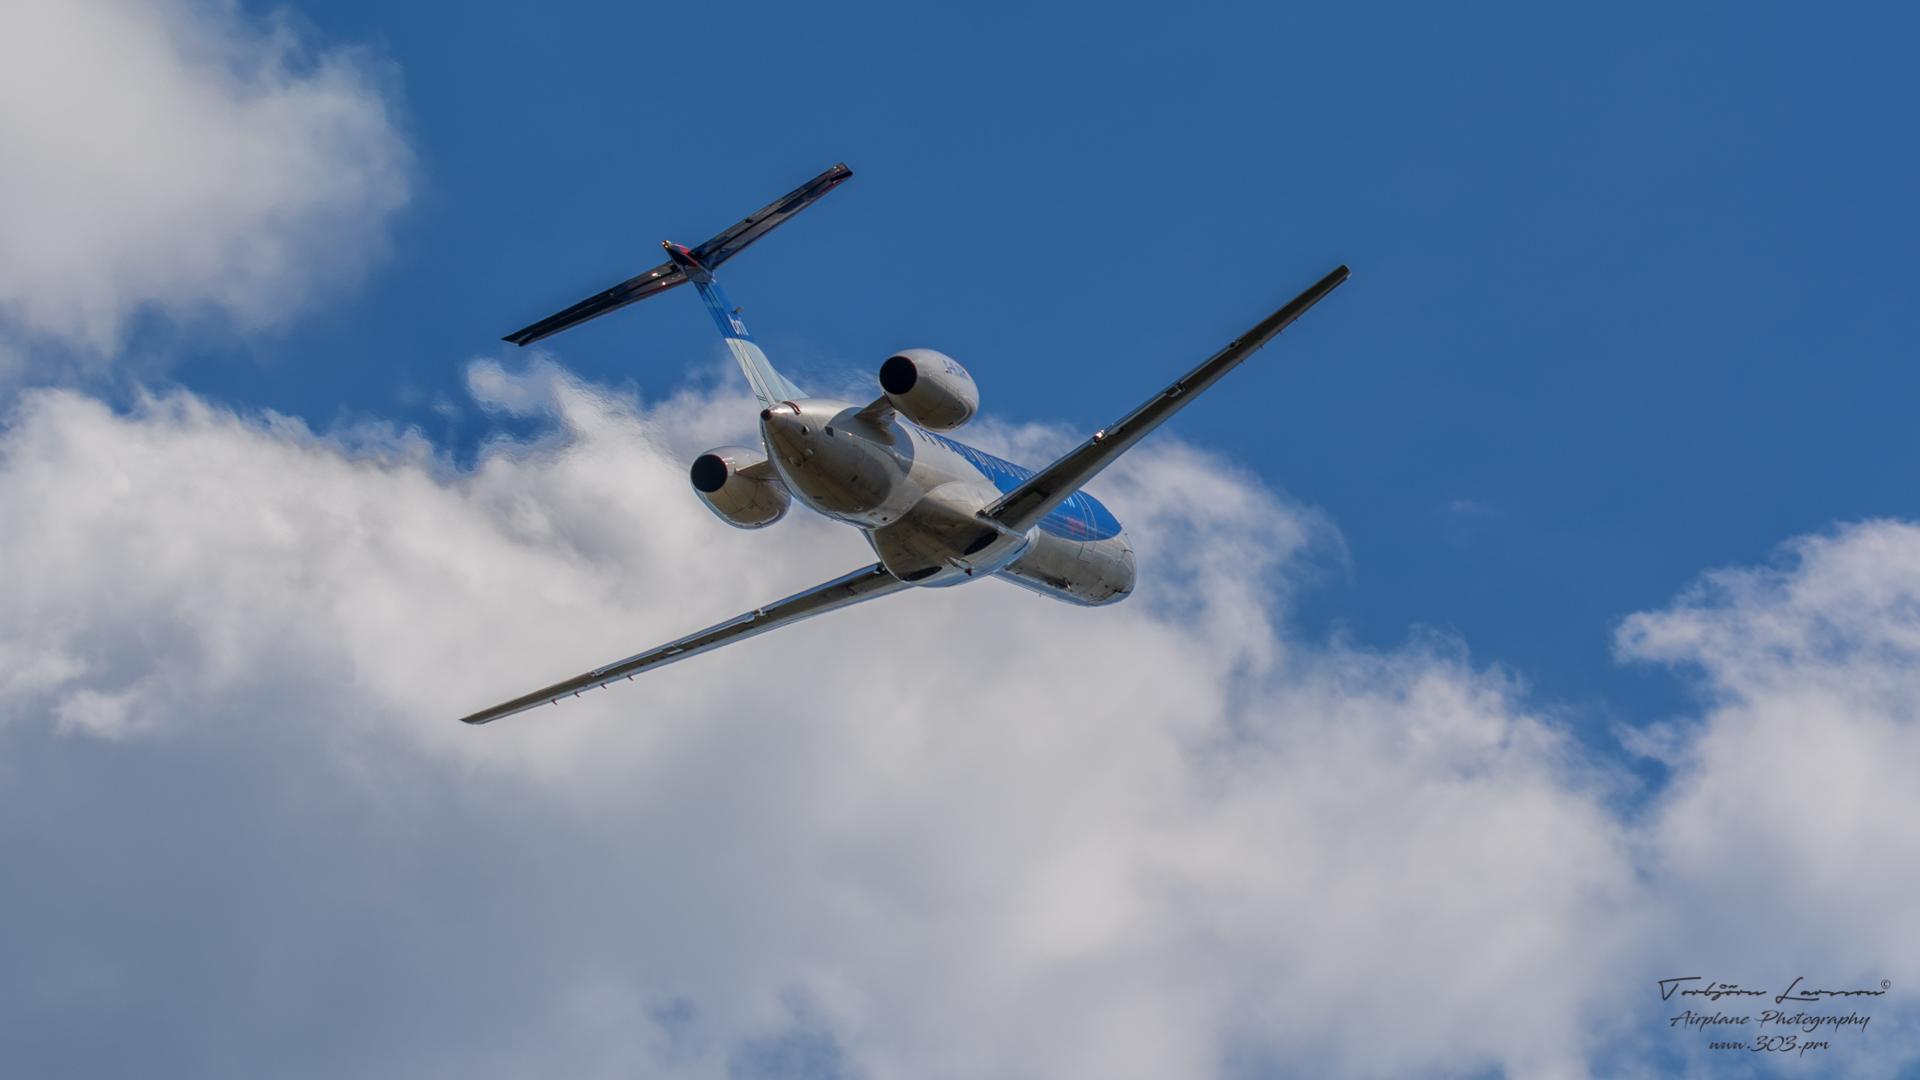 DSC_3355-Embraer ERJ-145-EP - bmi regional (G-RJXH)